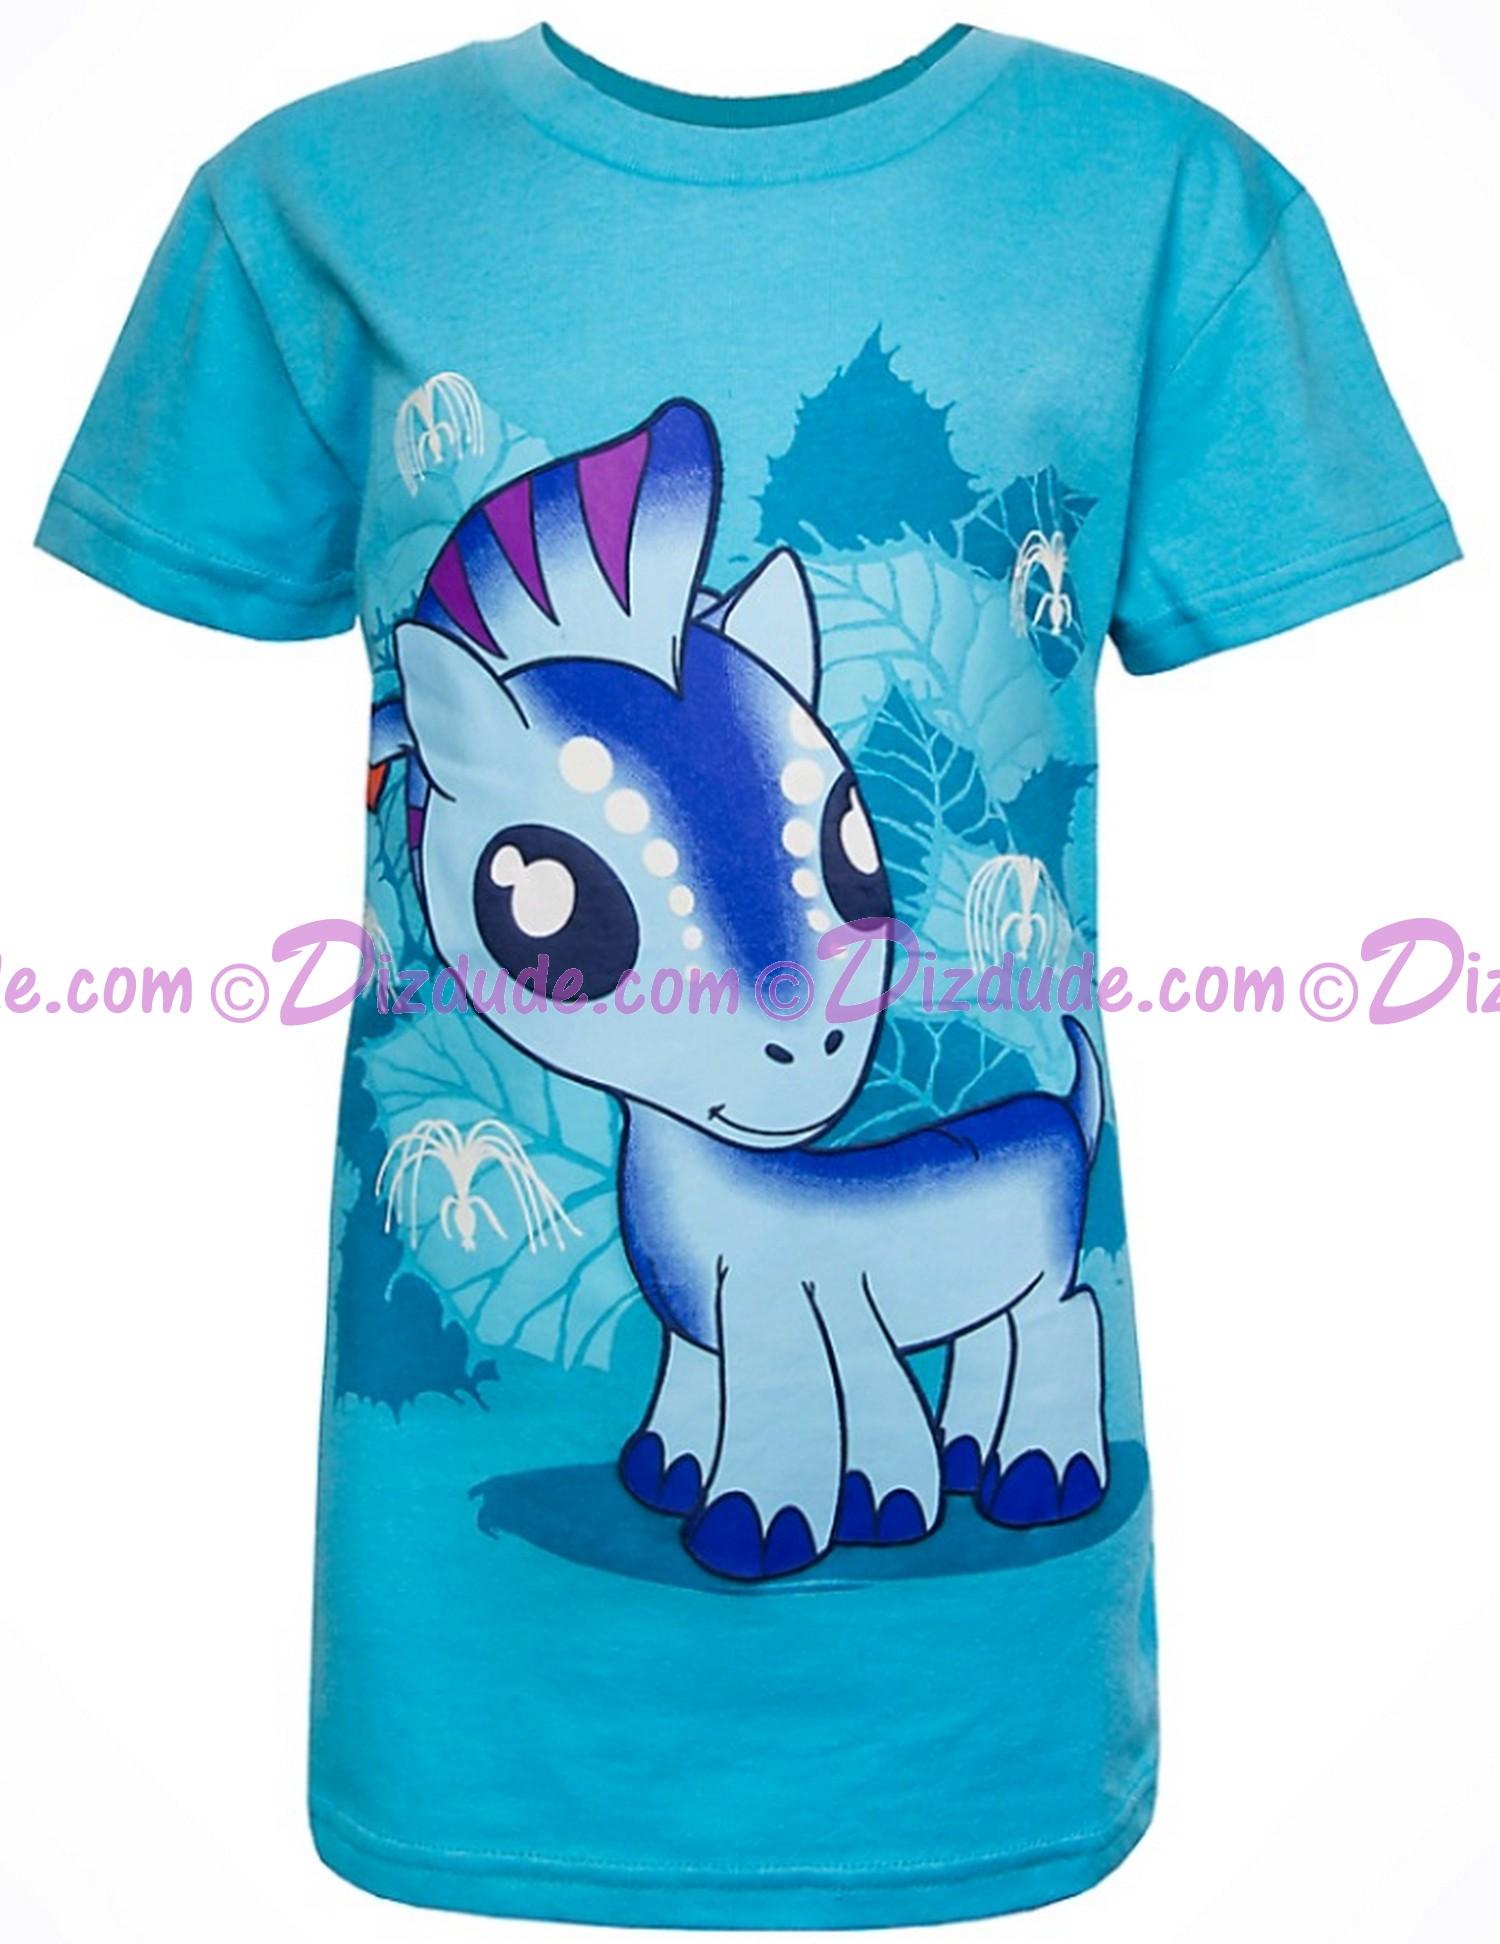 Avatar Direhorse Youth T-shirt (Tee, Tshirt or T shirt) - Disney Pandora – The World of Avatar